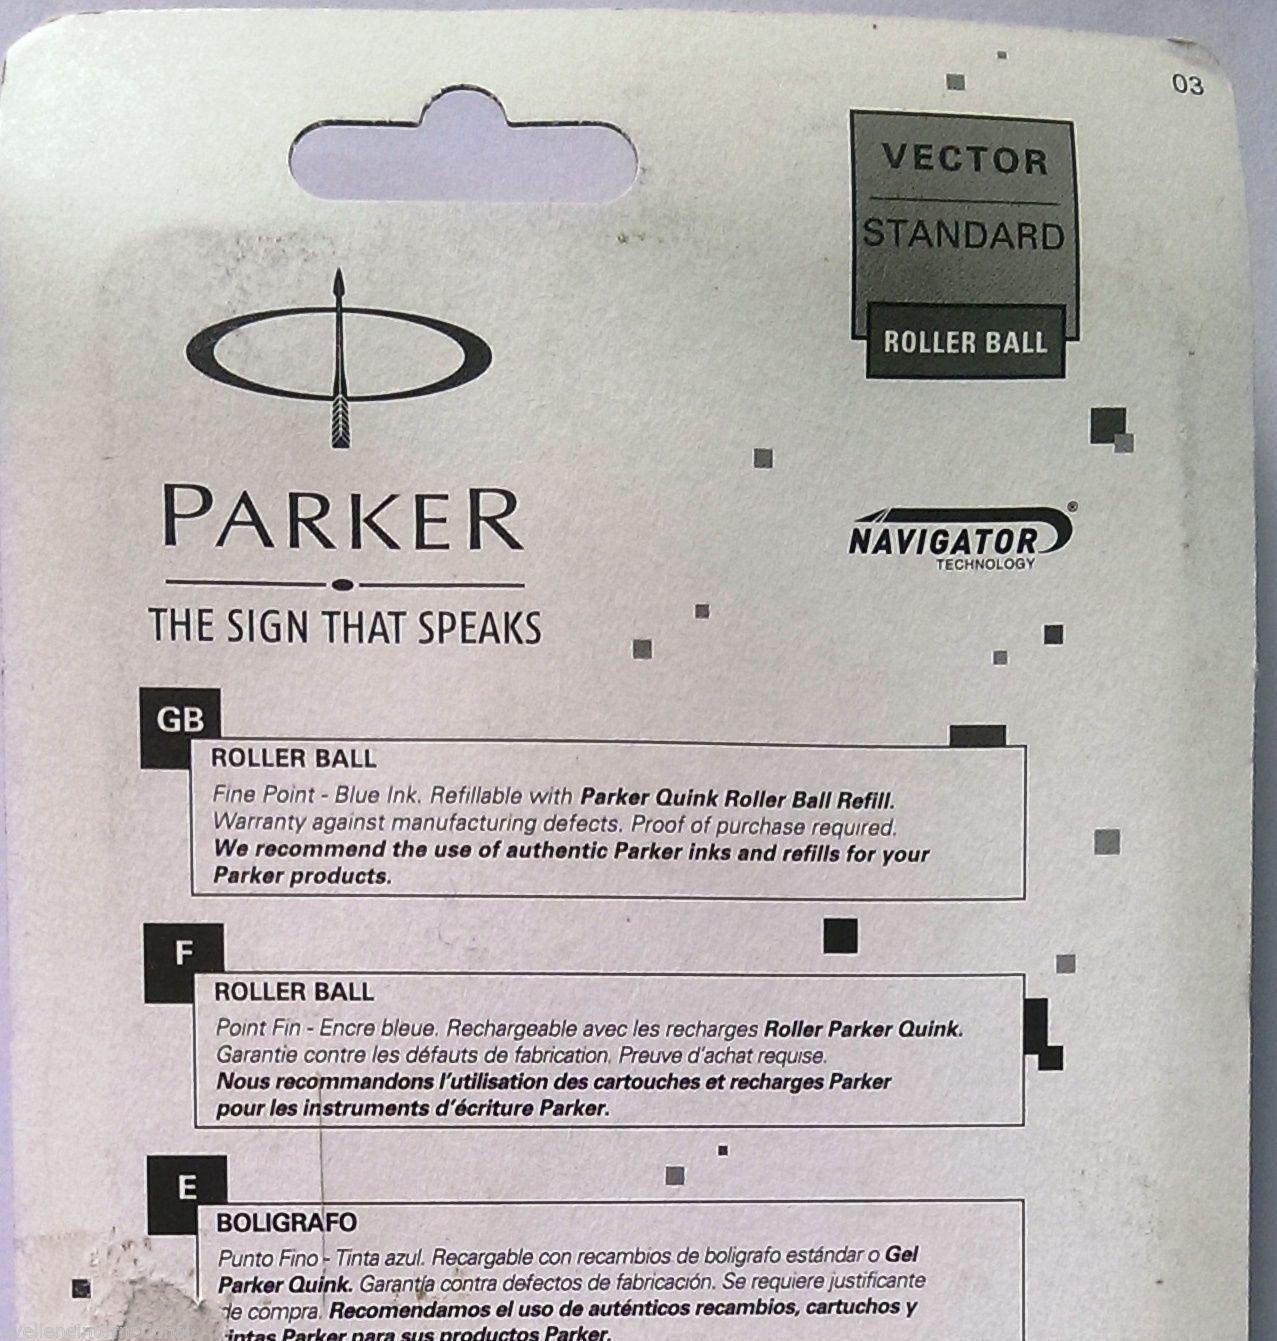 Parker Vector Standard  Roller Ball Pen  Body Color Black